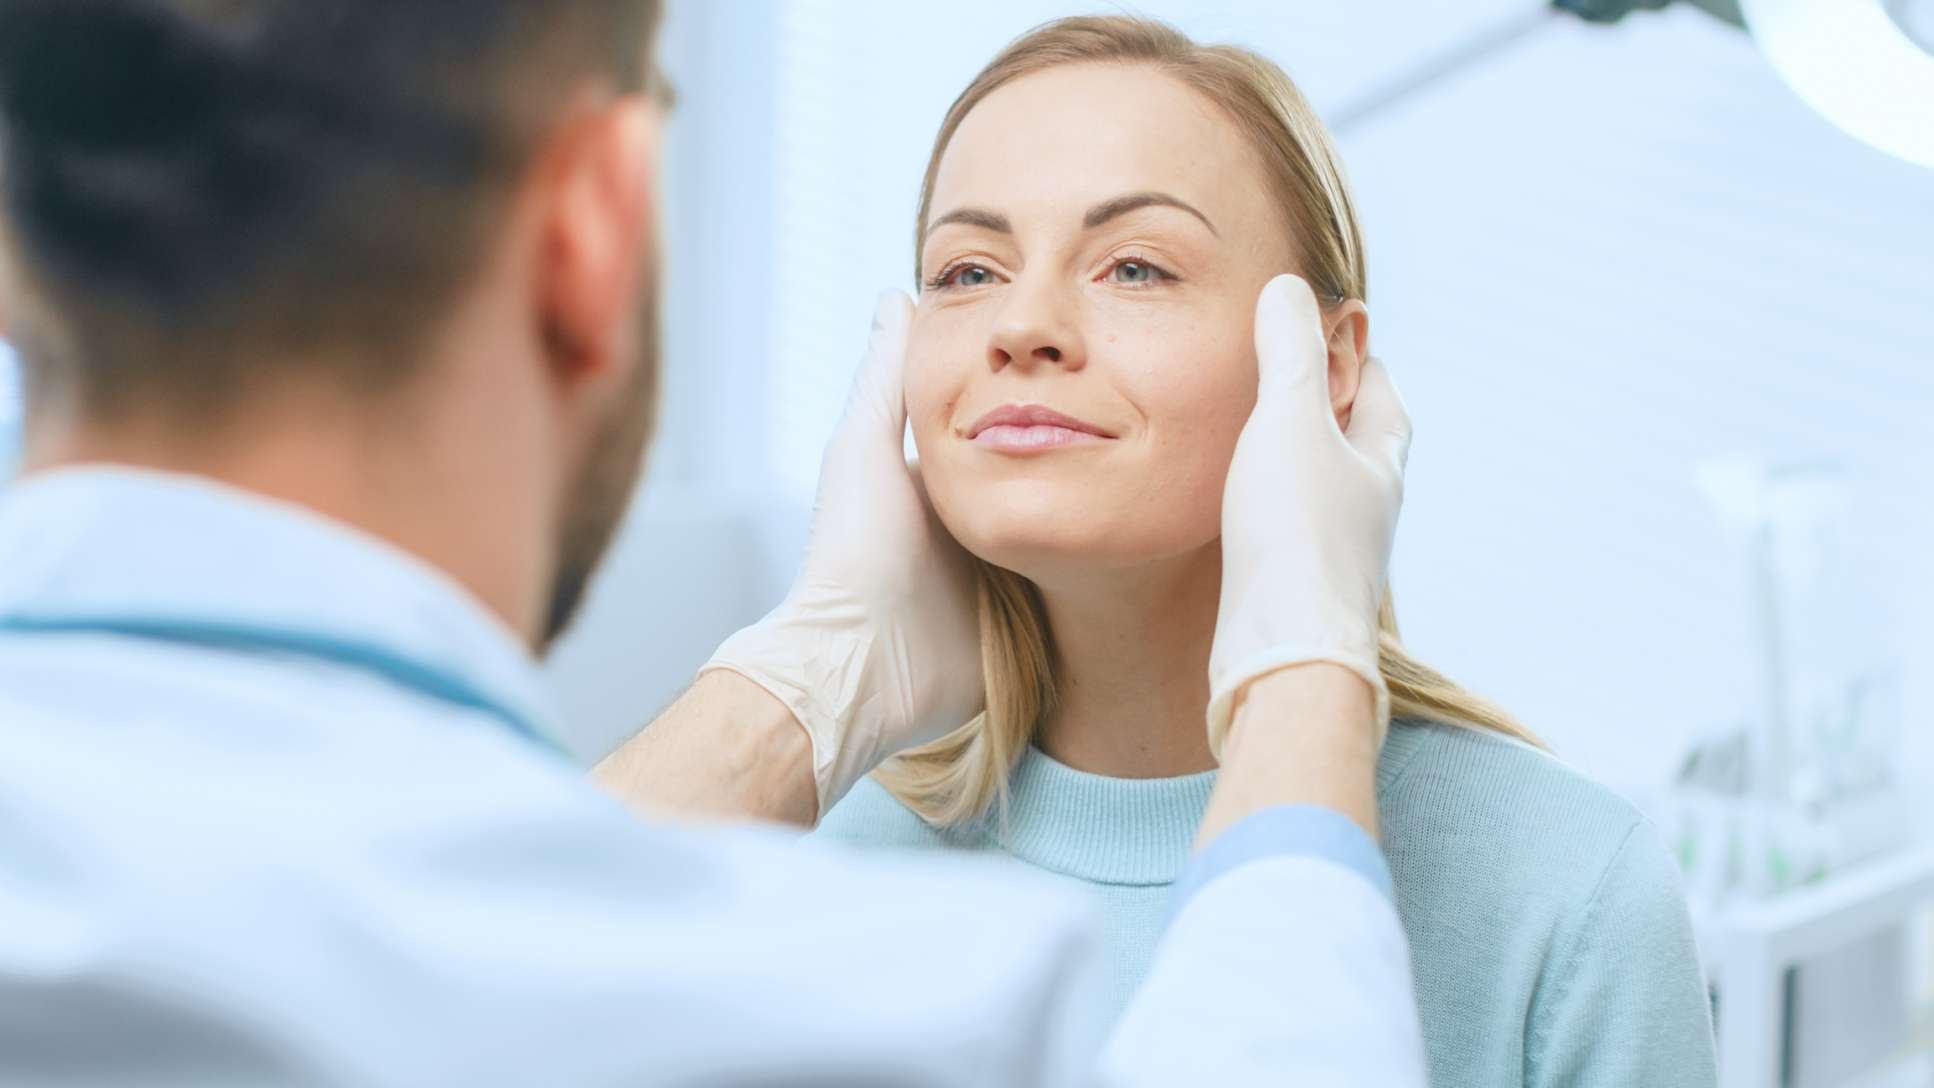 Plastic surgeon examining woman